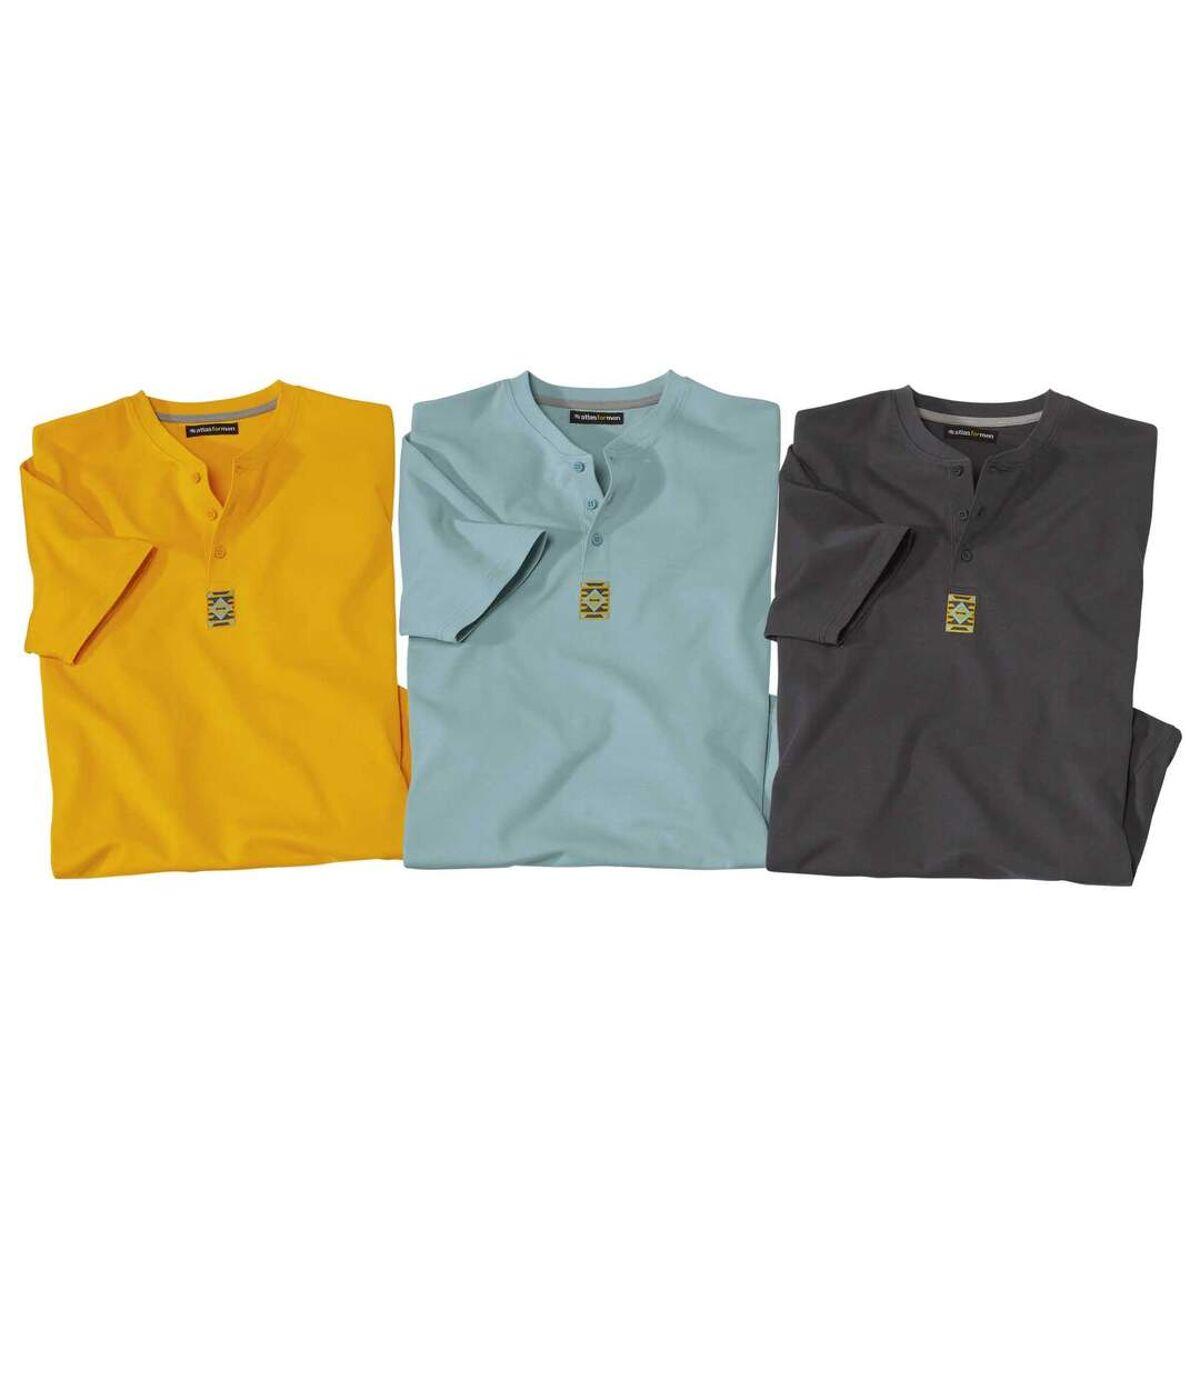 Lot de 3 Tee-shirts Col Tunisien Unis  Atlas For Men